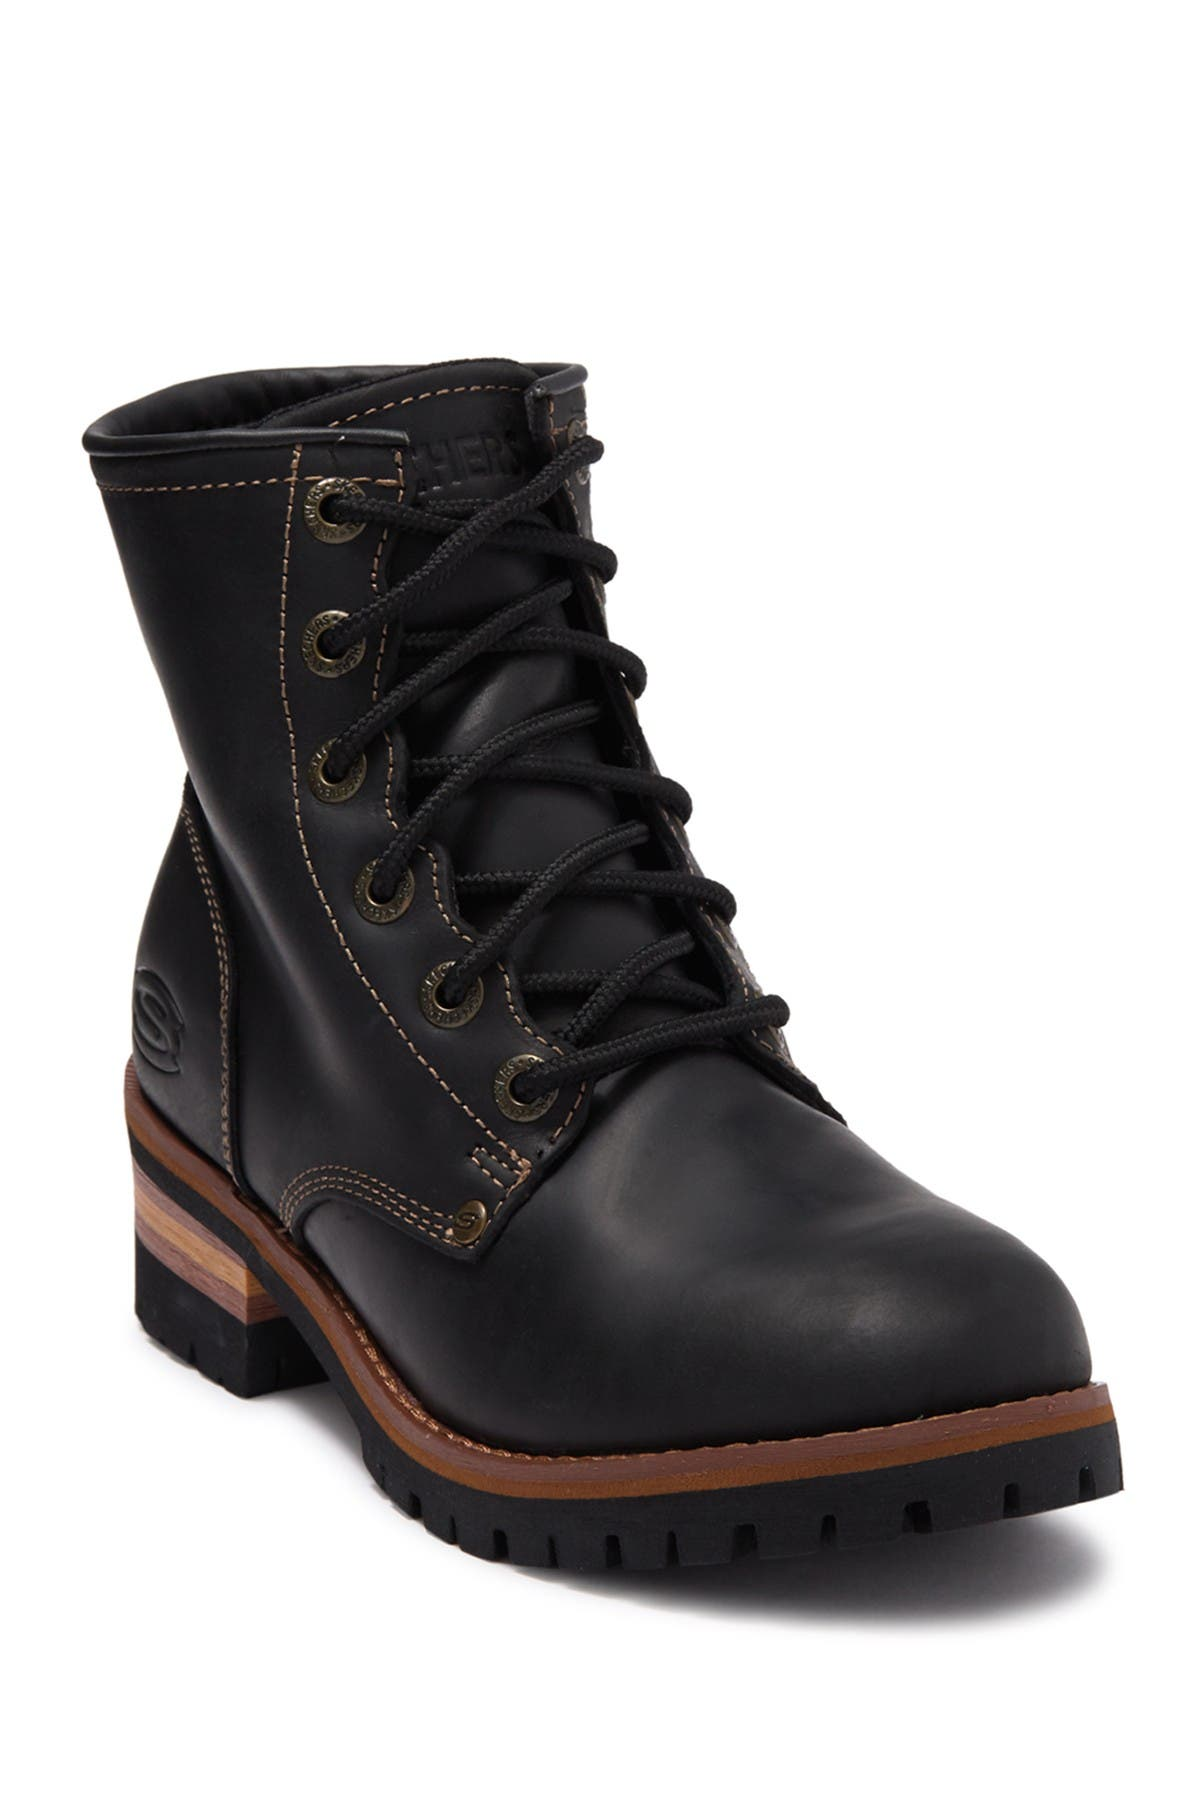 Image of Skechers Laramie 2 Leather Boot